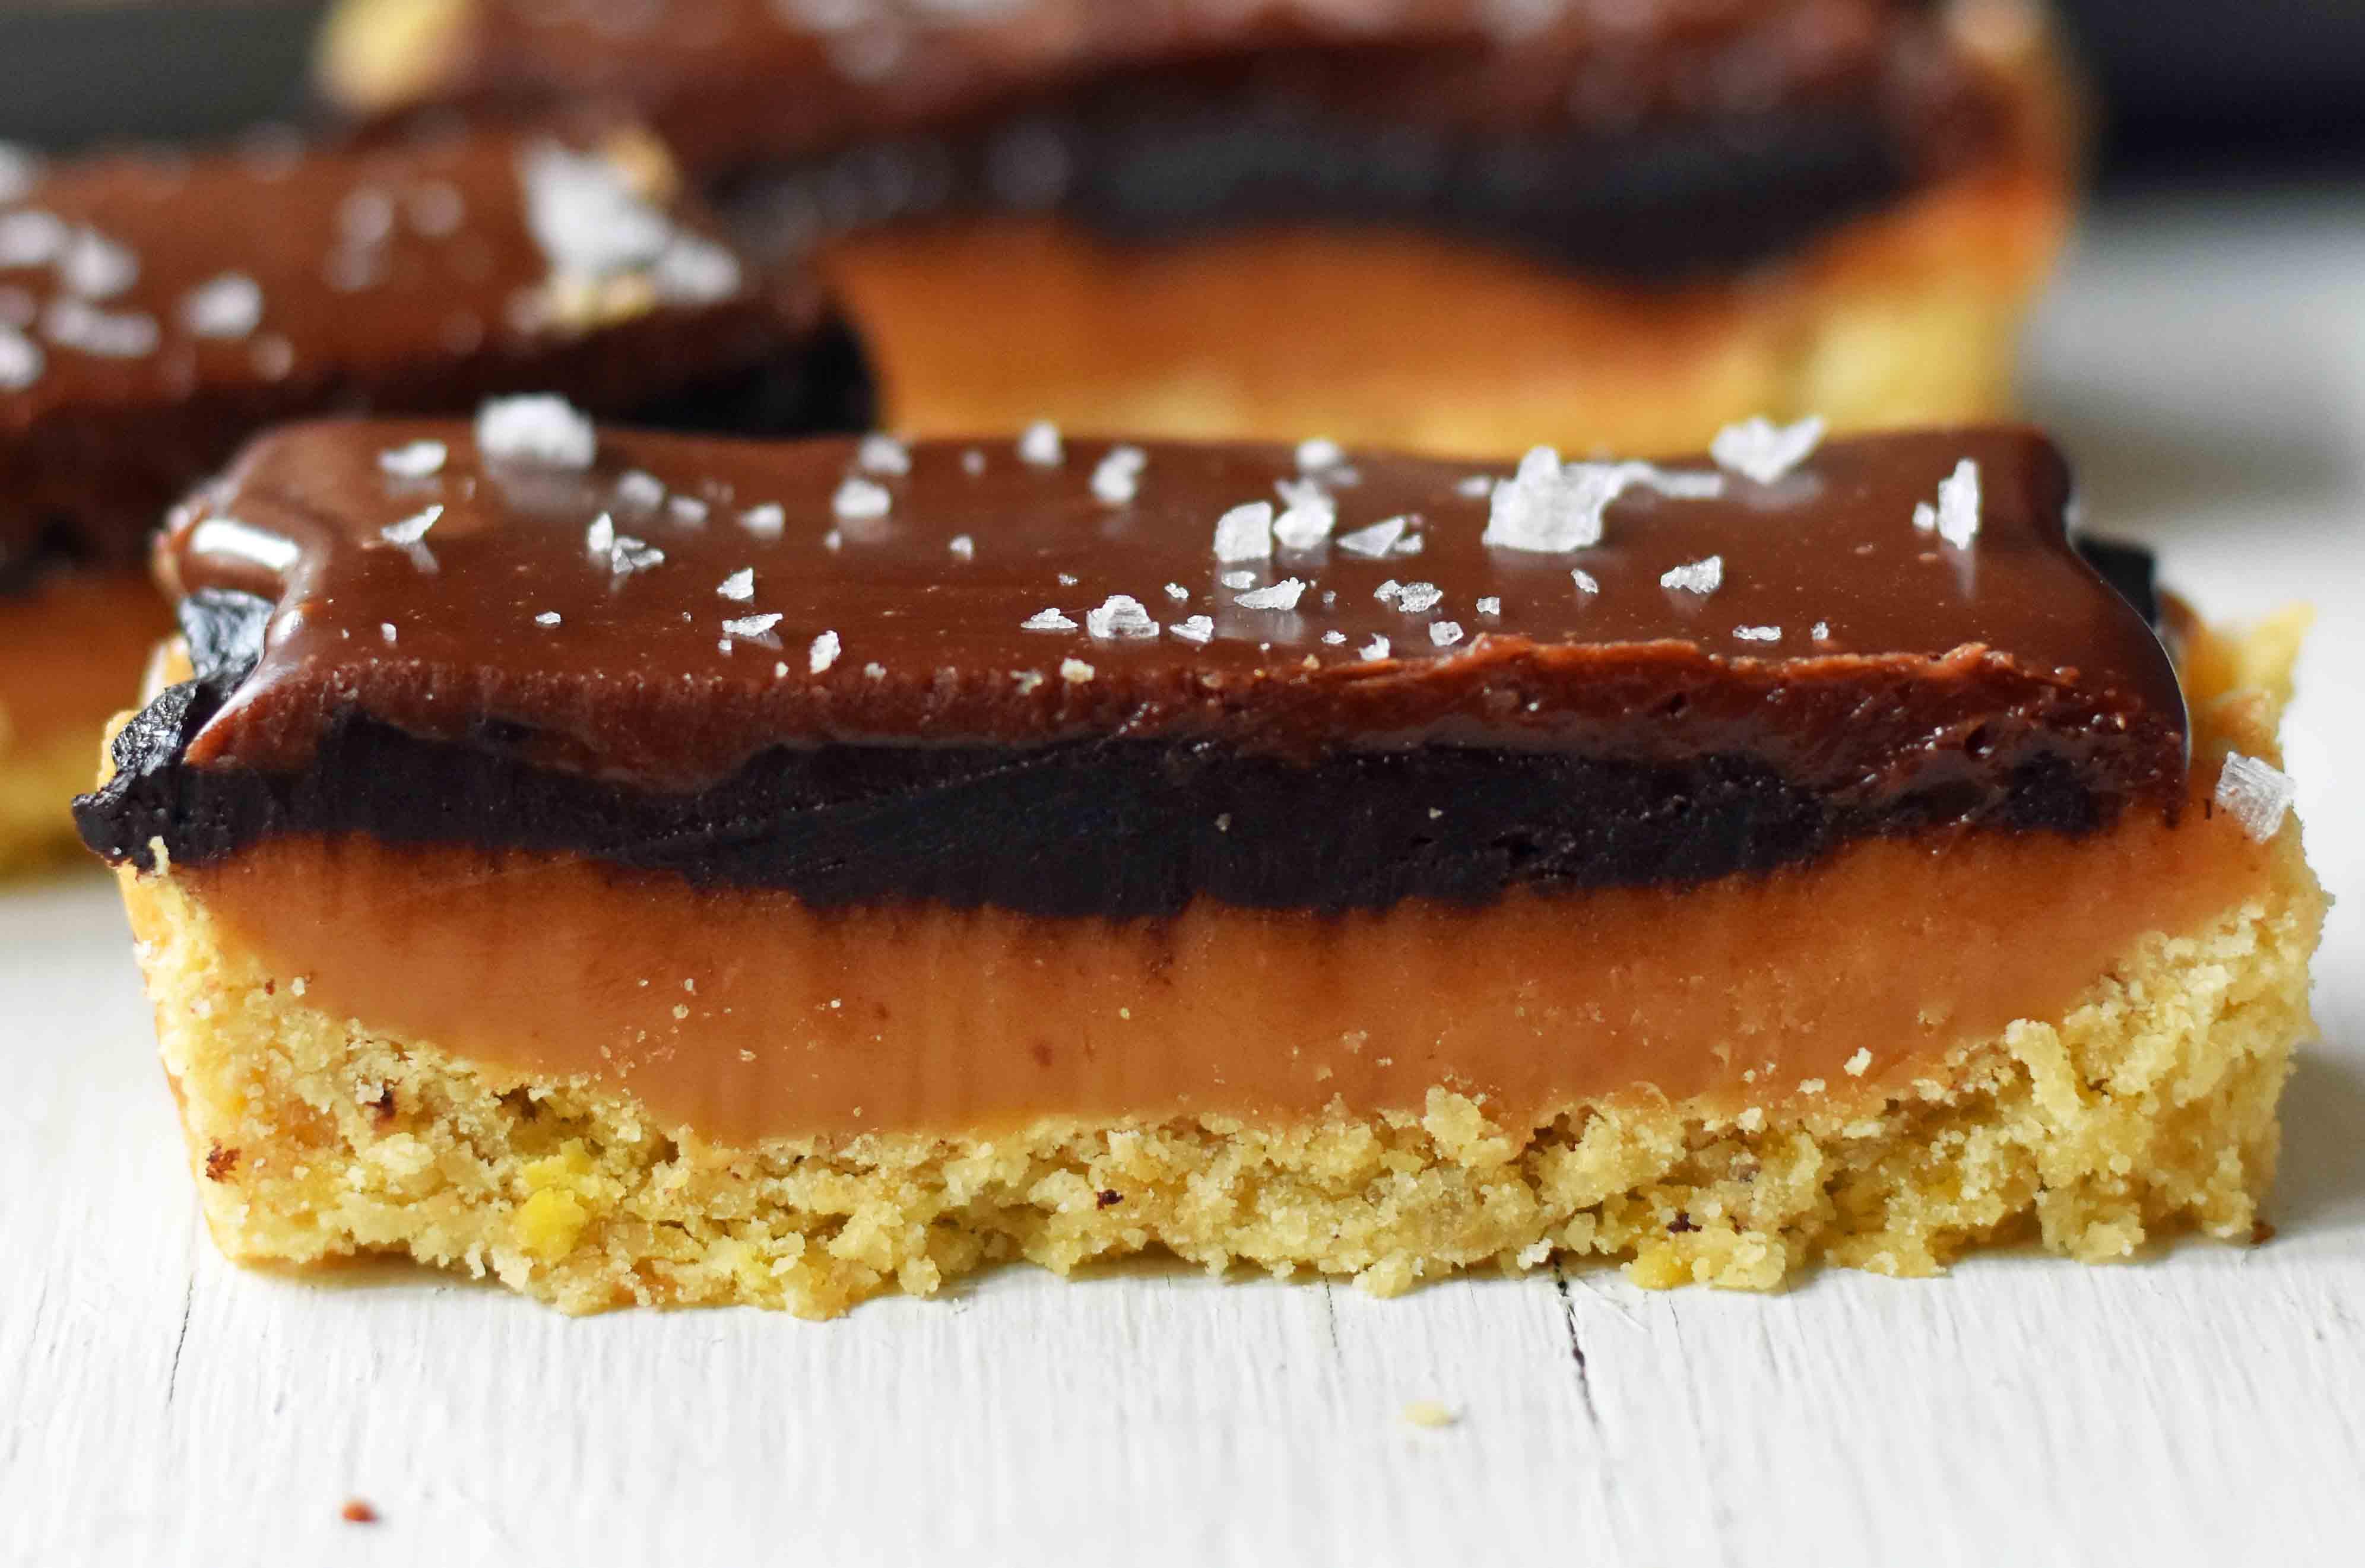 Chocolate Caramel Slice 7